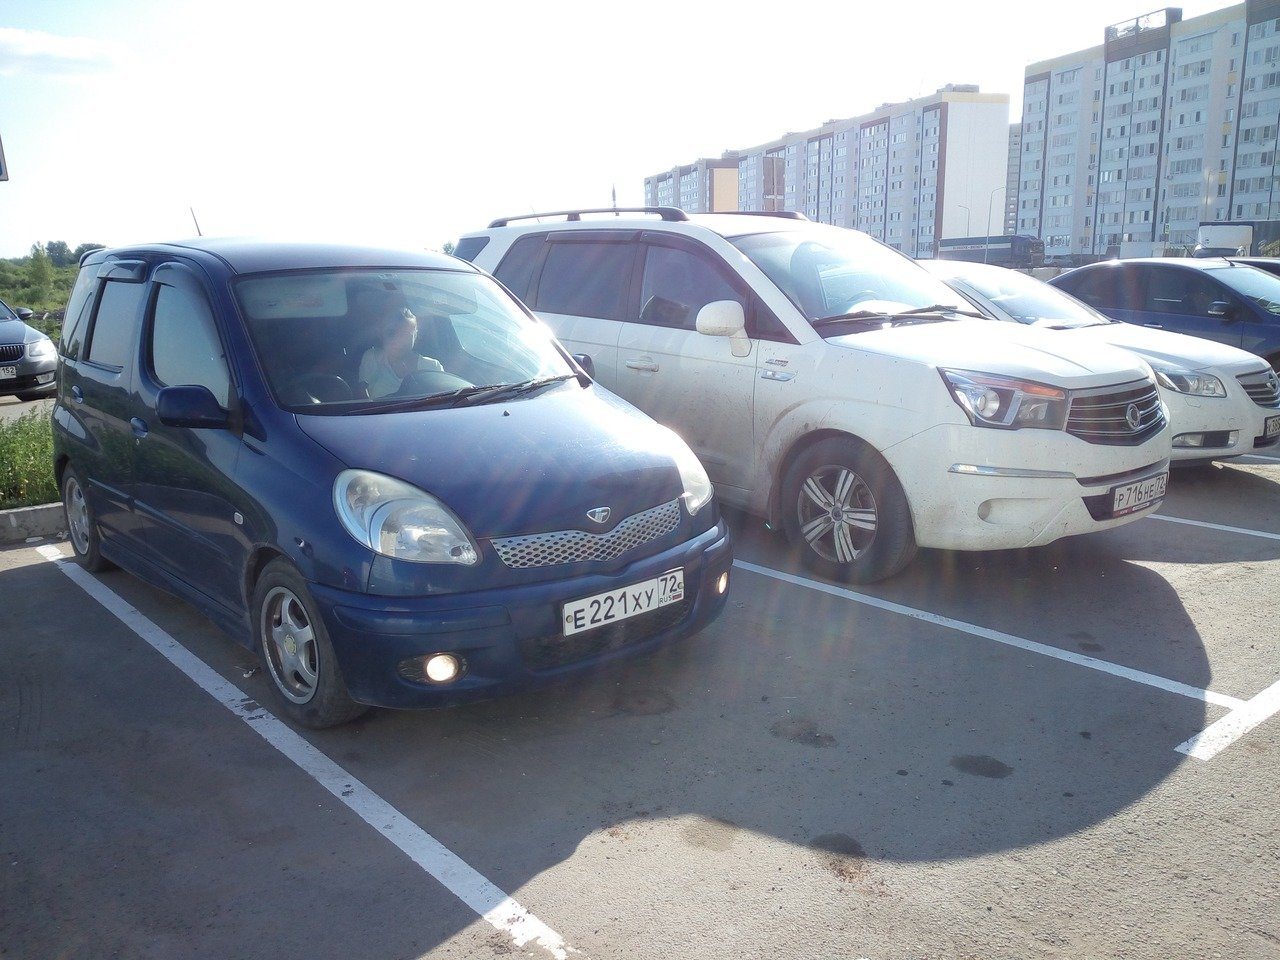 семейная парковка - Фунтик и Ставик :)